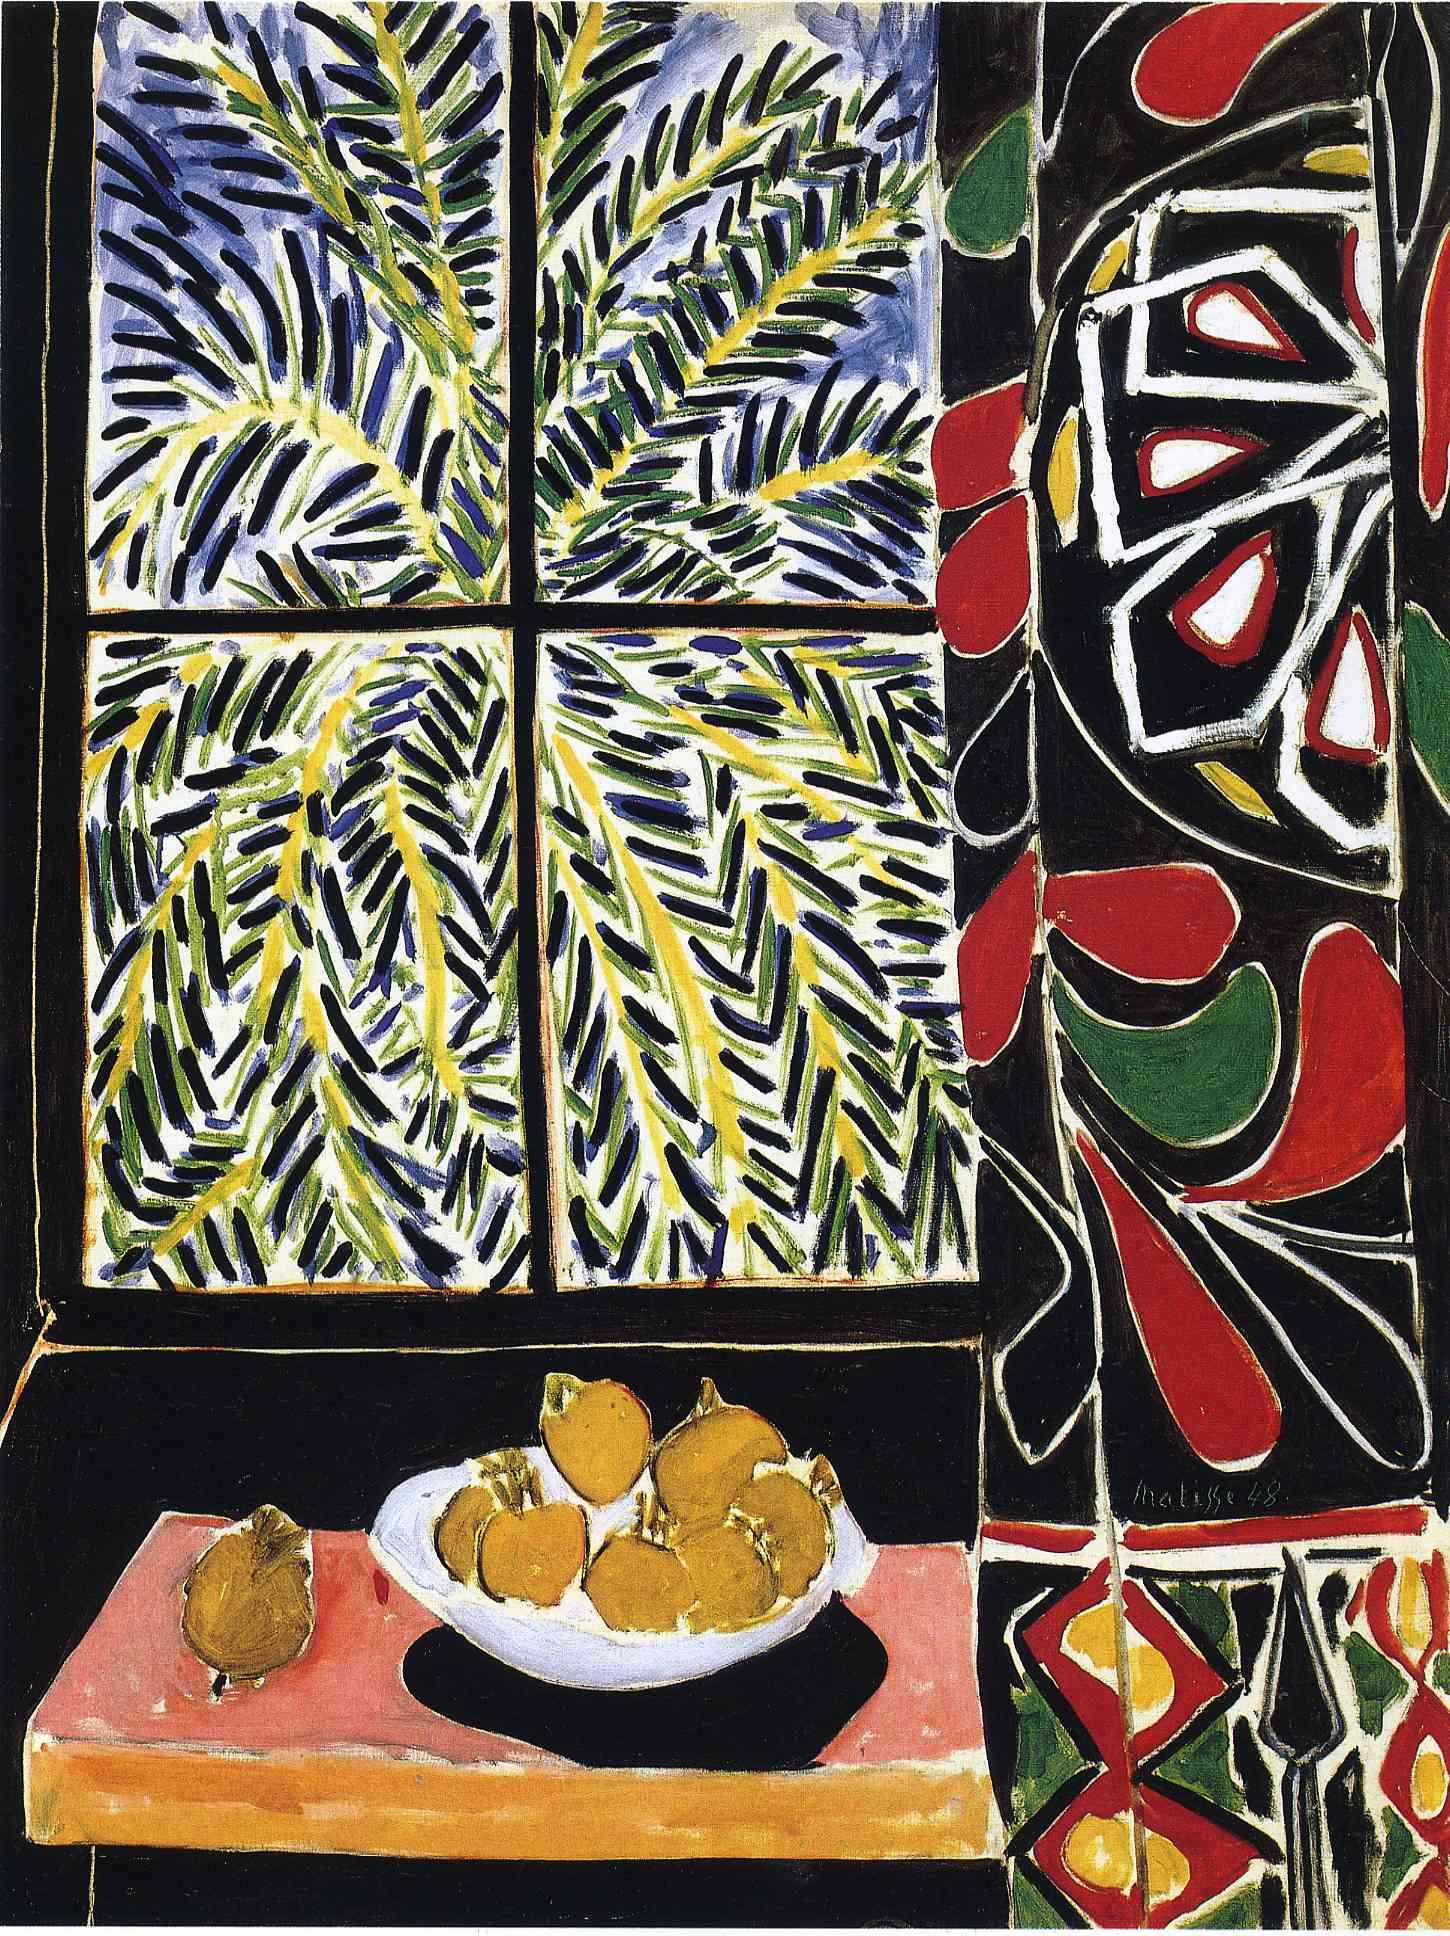 A comparison of works between henri matisse and willem de kooning